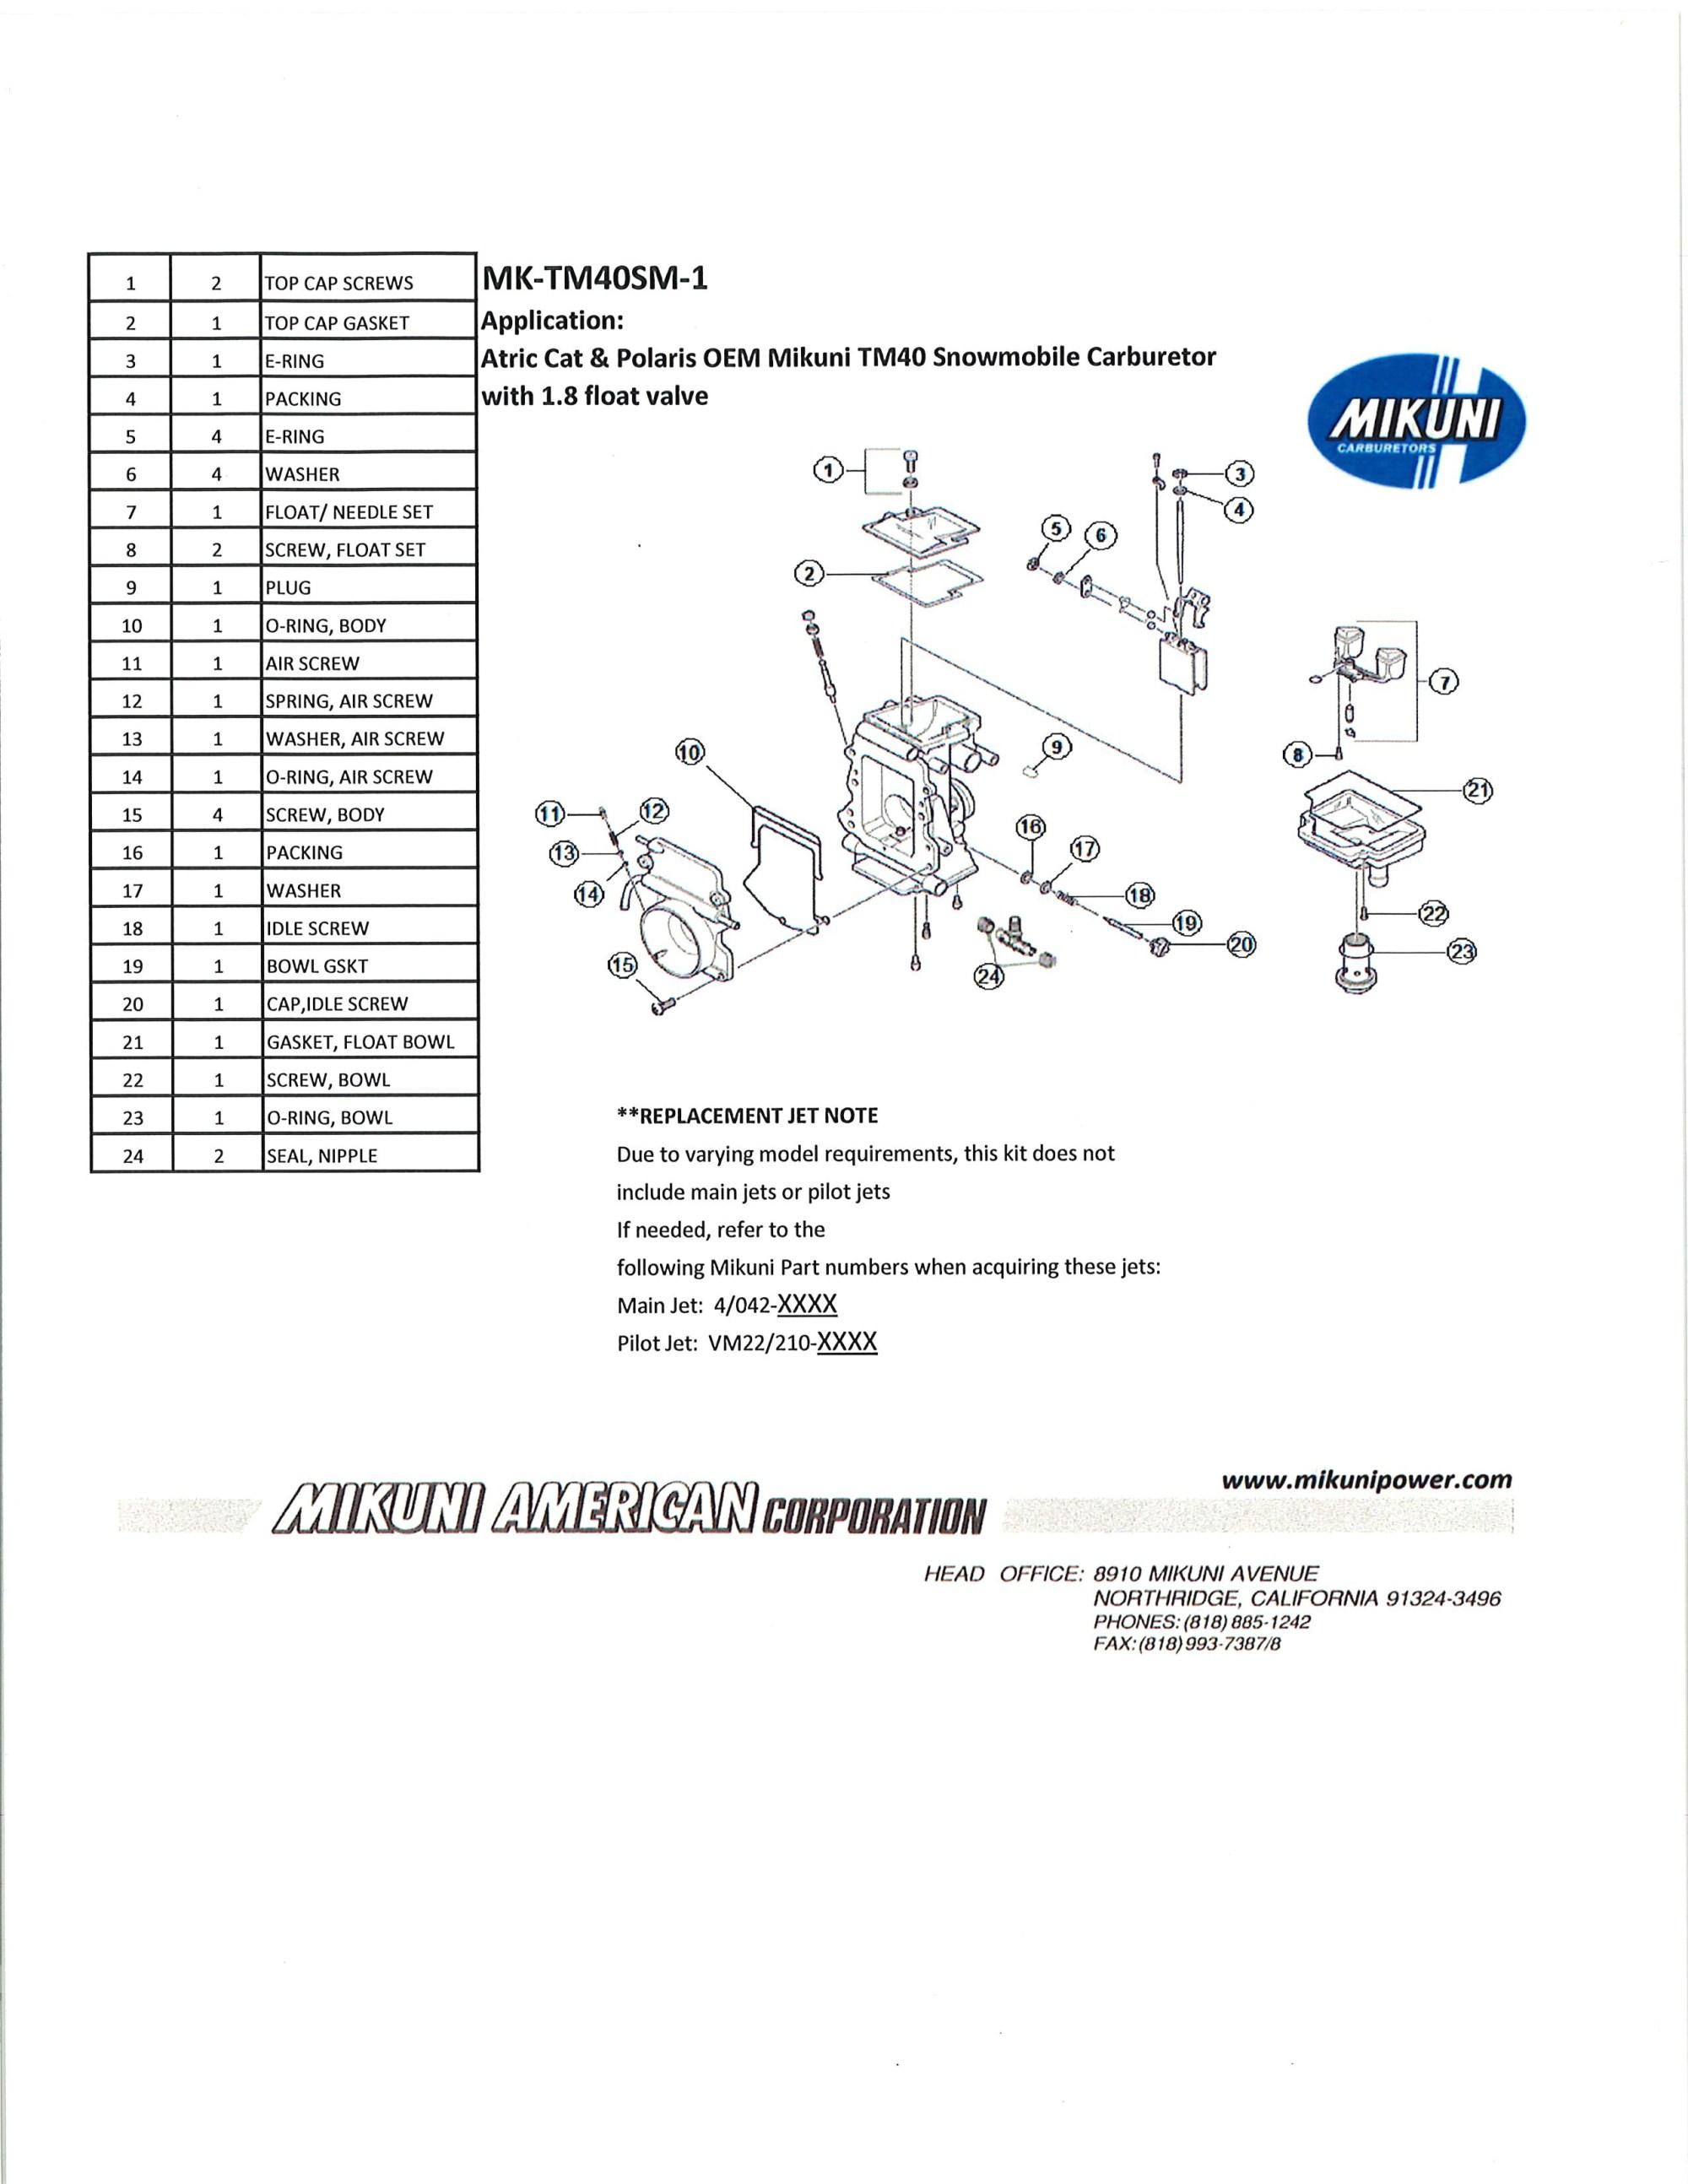 hight resolution of fits oem mikuni tm40 carburetors on arctic cat and polaris snowmobiles with a 1 8 float valve